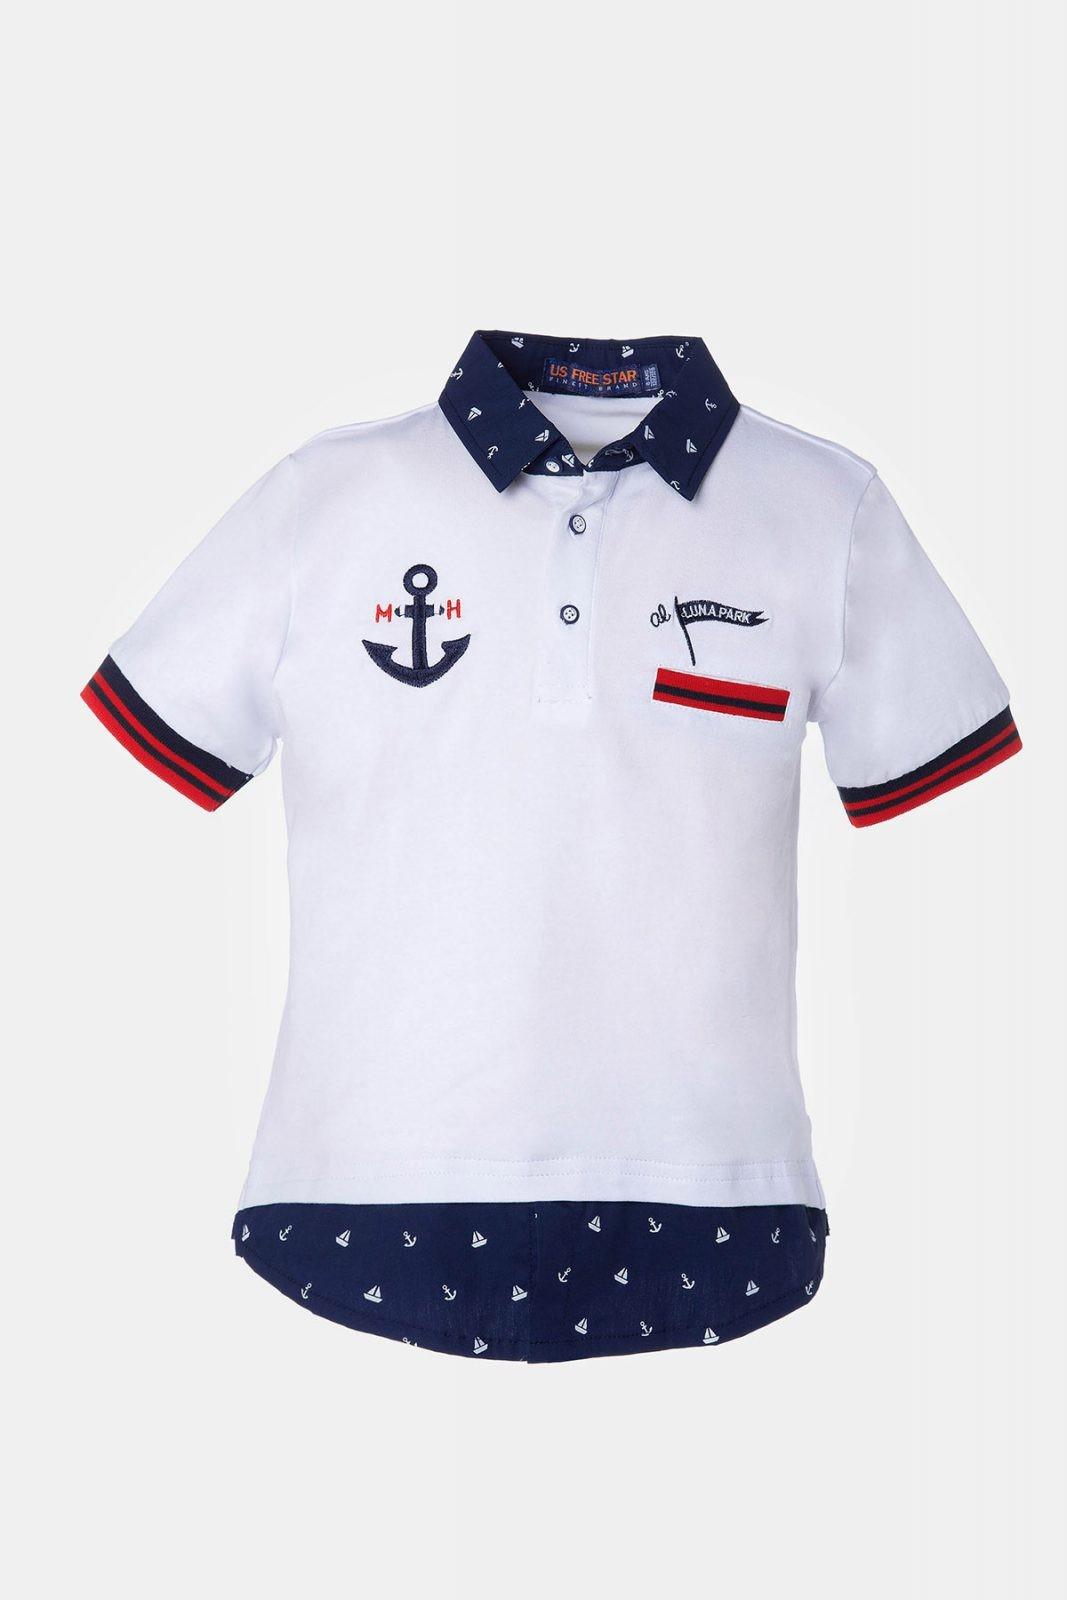 140486caea91 Παιδική μπλούζα για αγόρια - Ersas Παιδικά, Βρεφικά Ρούχα